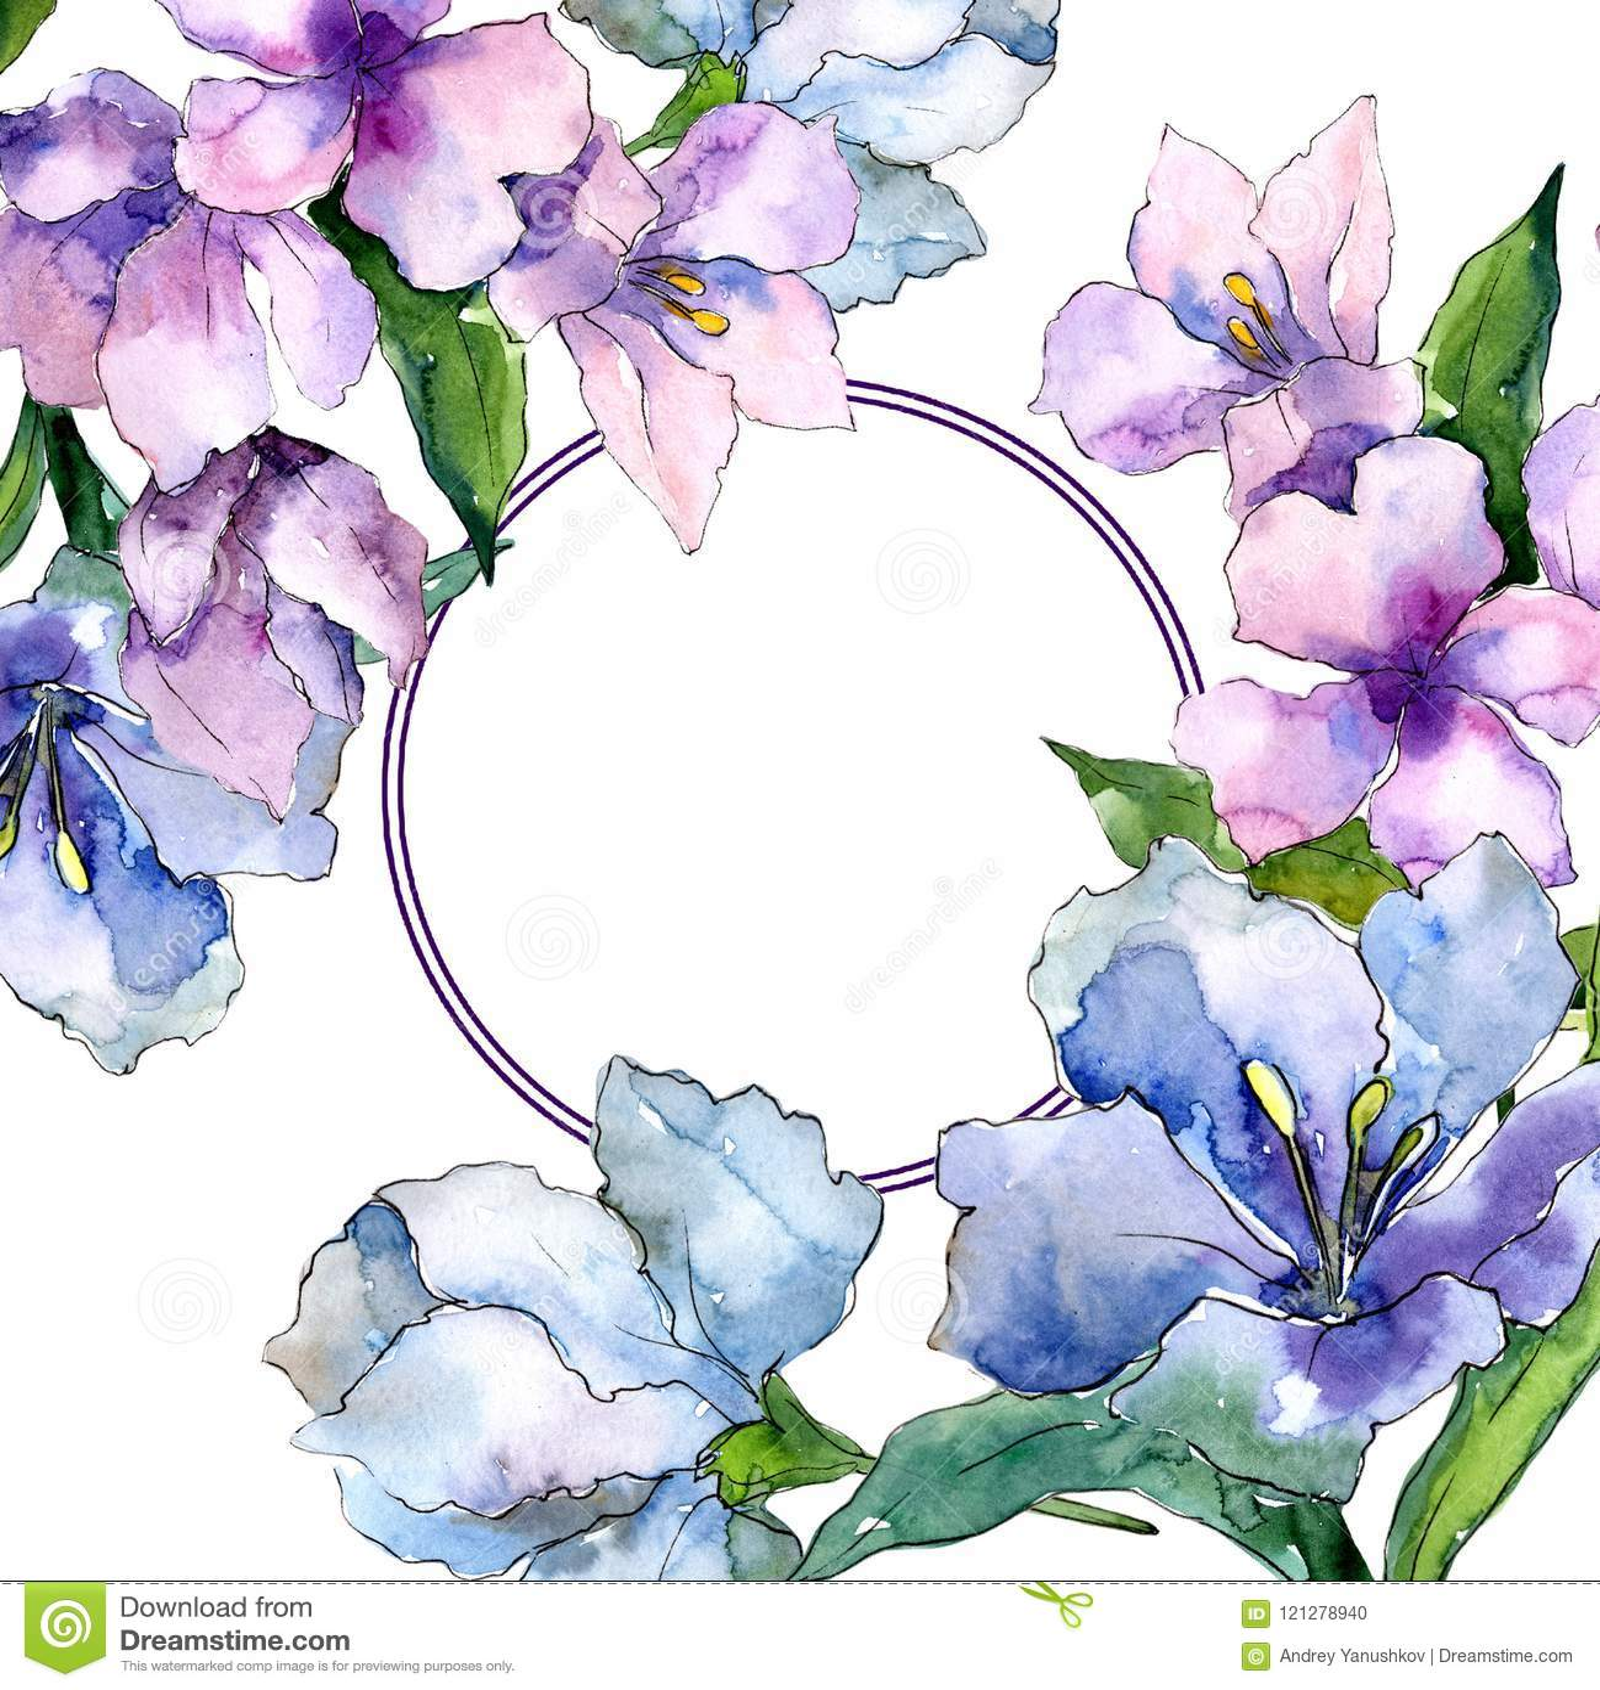 Purple and blue alstroemeria flowers floral botanical flower frame purple and blue alstroemeria flowers floral botanical flower frame border ornament square izmirmasajfo